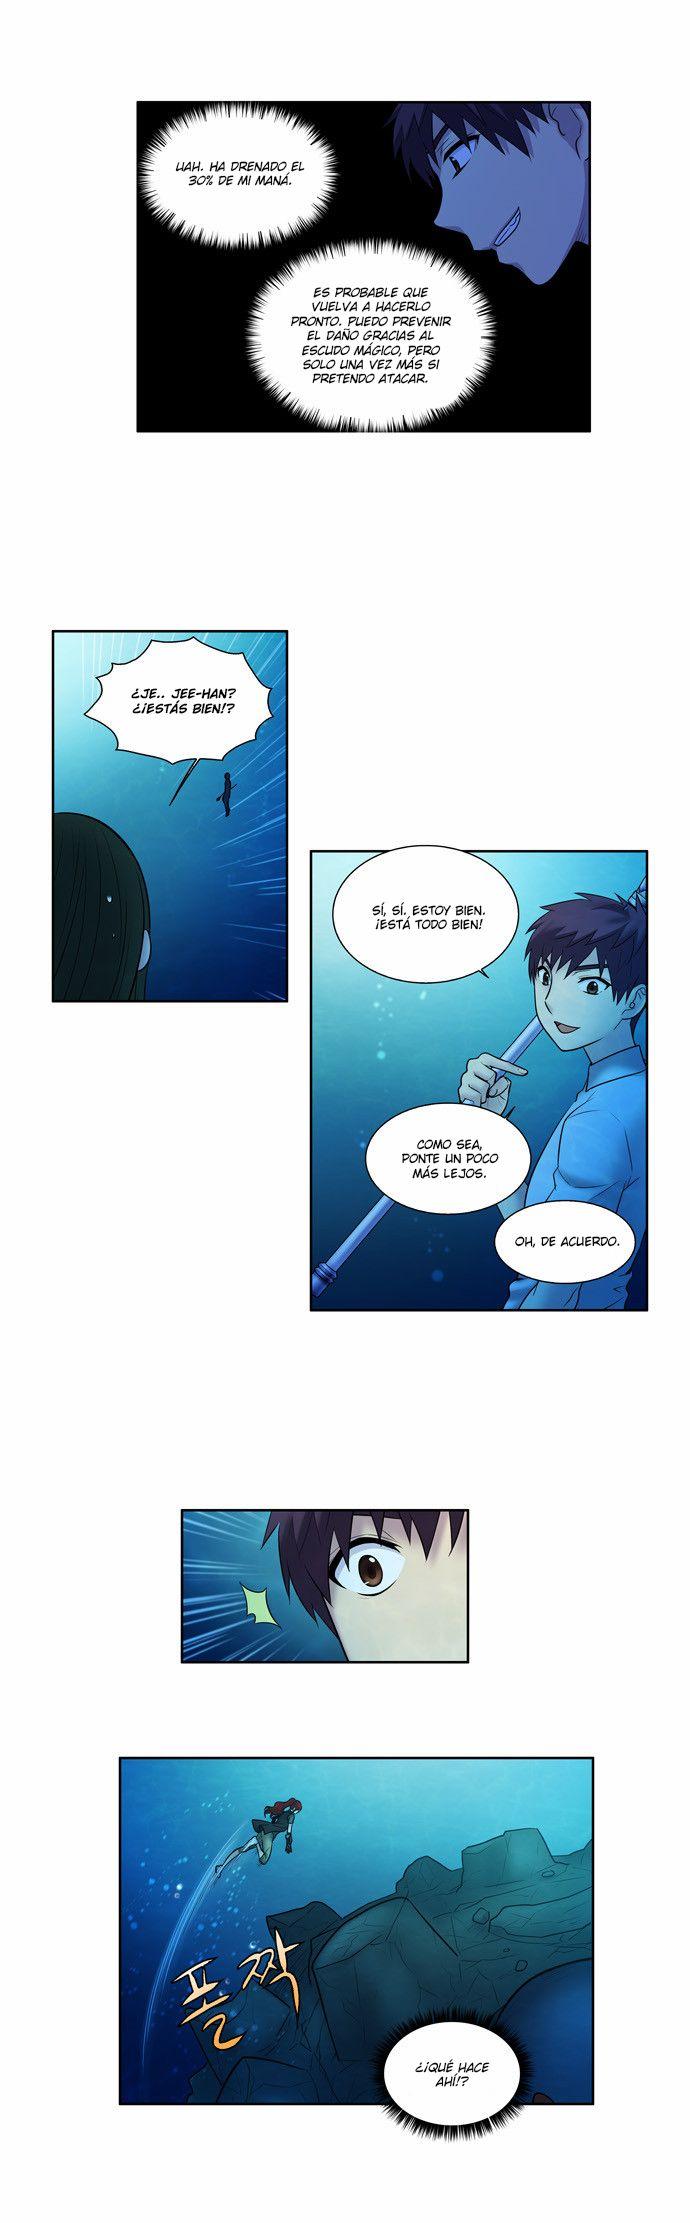 http://c5.ninemanga.com/es_manga/pic2/61/1725/502851/bb43b255f1e4020e7ad8f6cd9d39fa9d.jpg Page 4